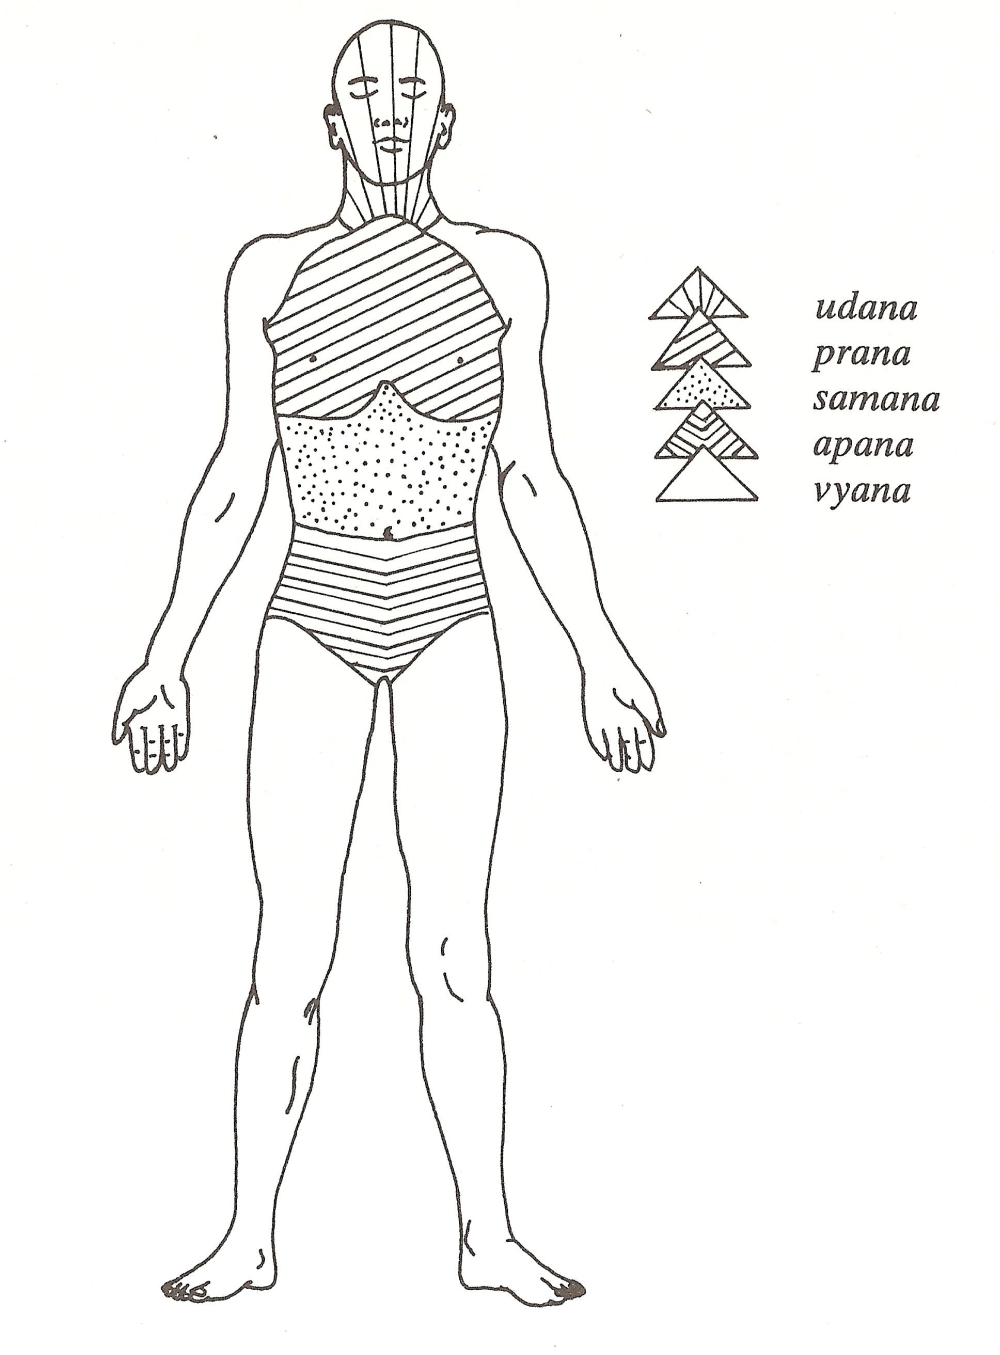 Introduzione al pranayama - Le 5 principali forze vitali